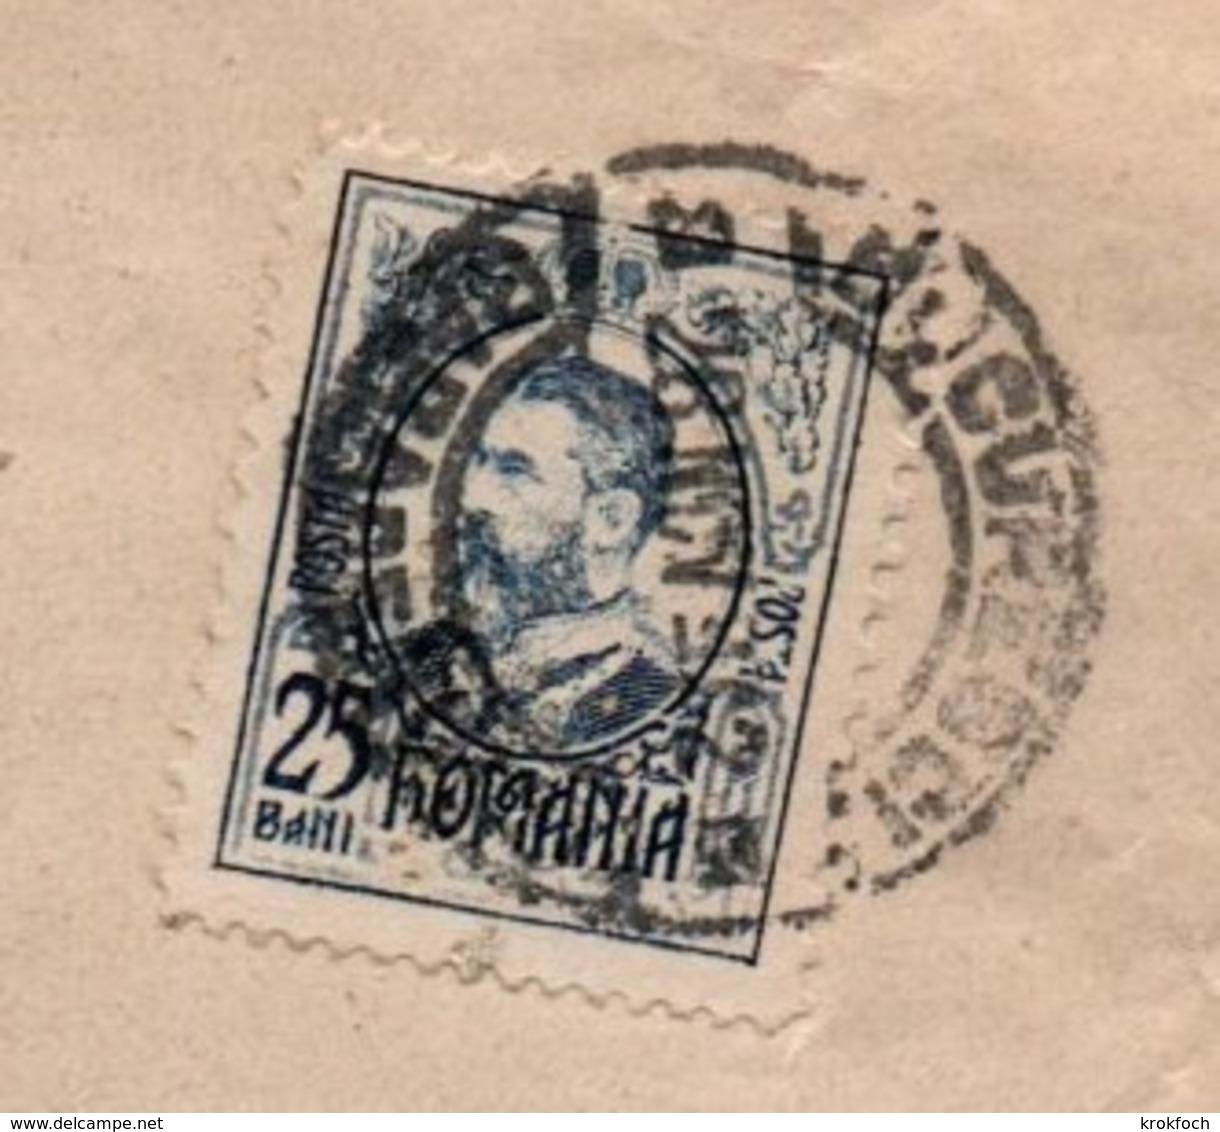 Banque Banca Perforé Roumanie - Marmorosch Bucuresti & Dall'Orso Galatz - Perfint Perforated - !!! Devant De Lettre Seul - Covers & Documents